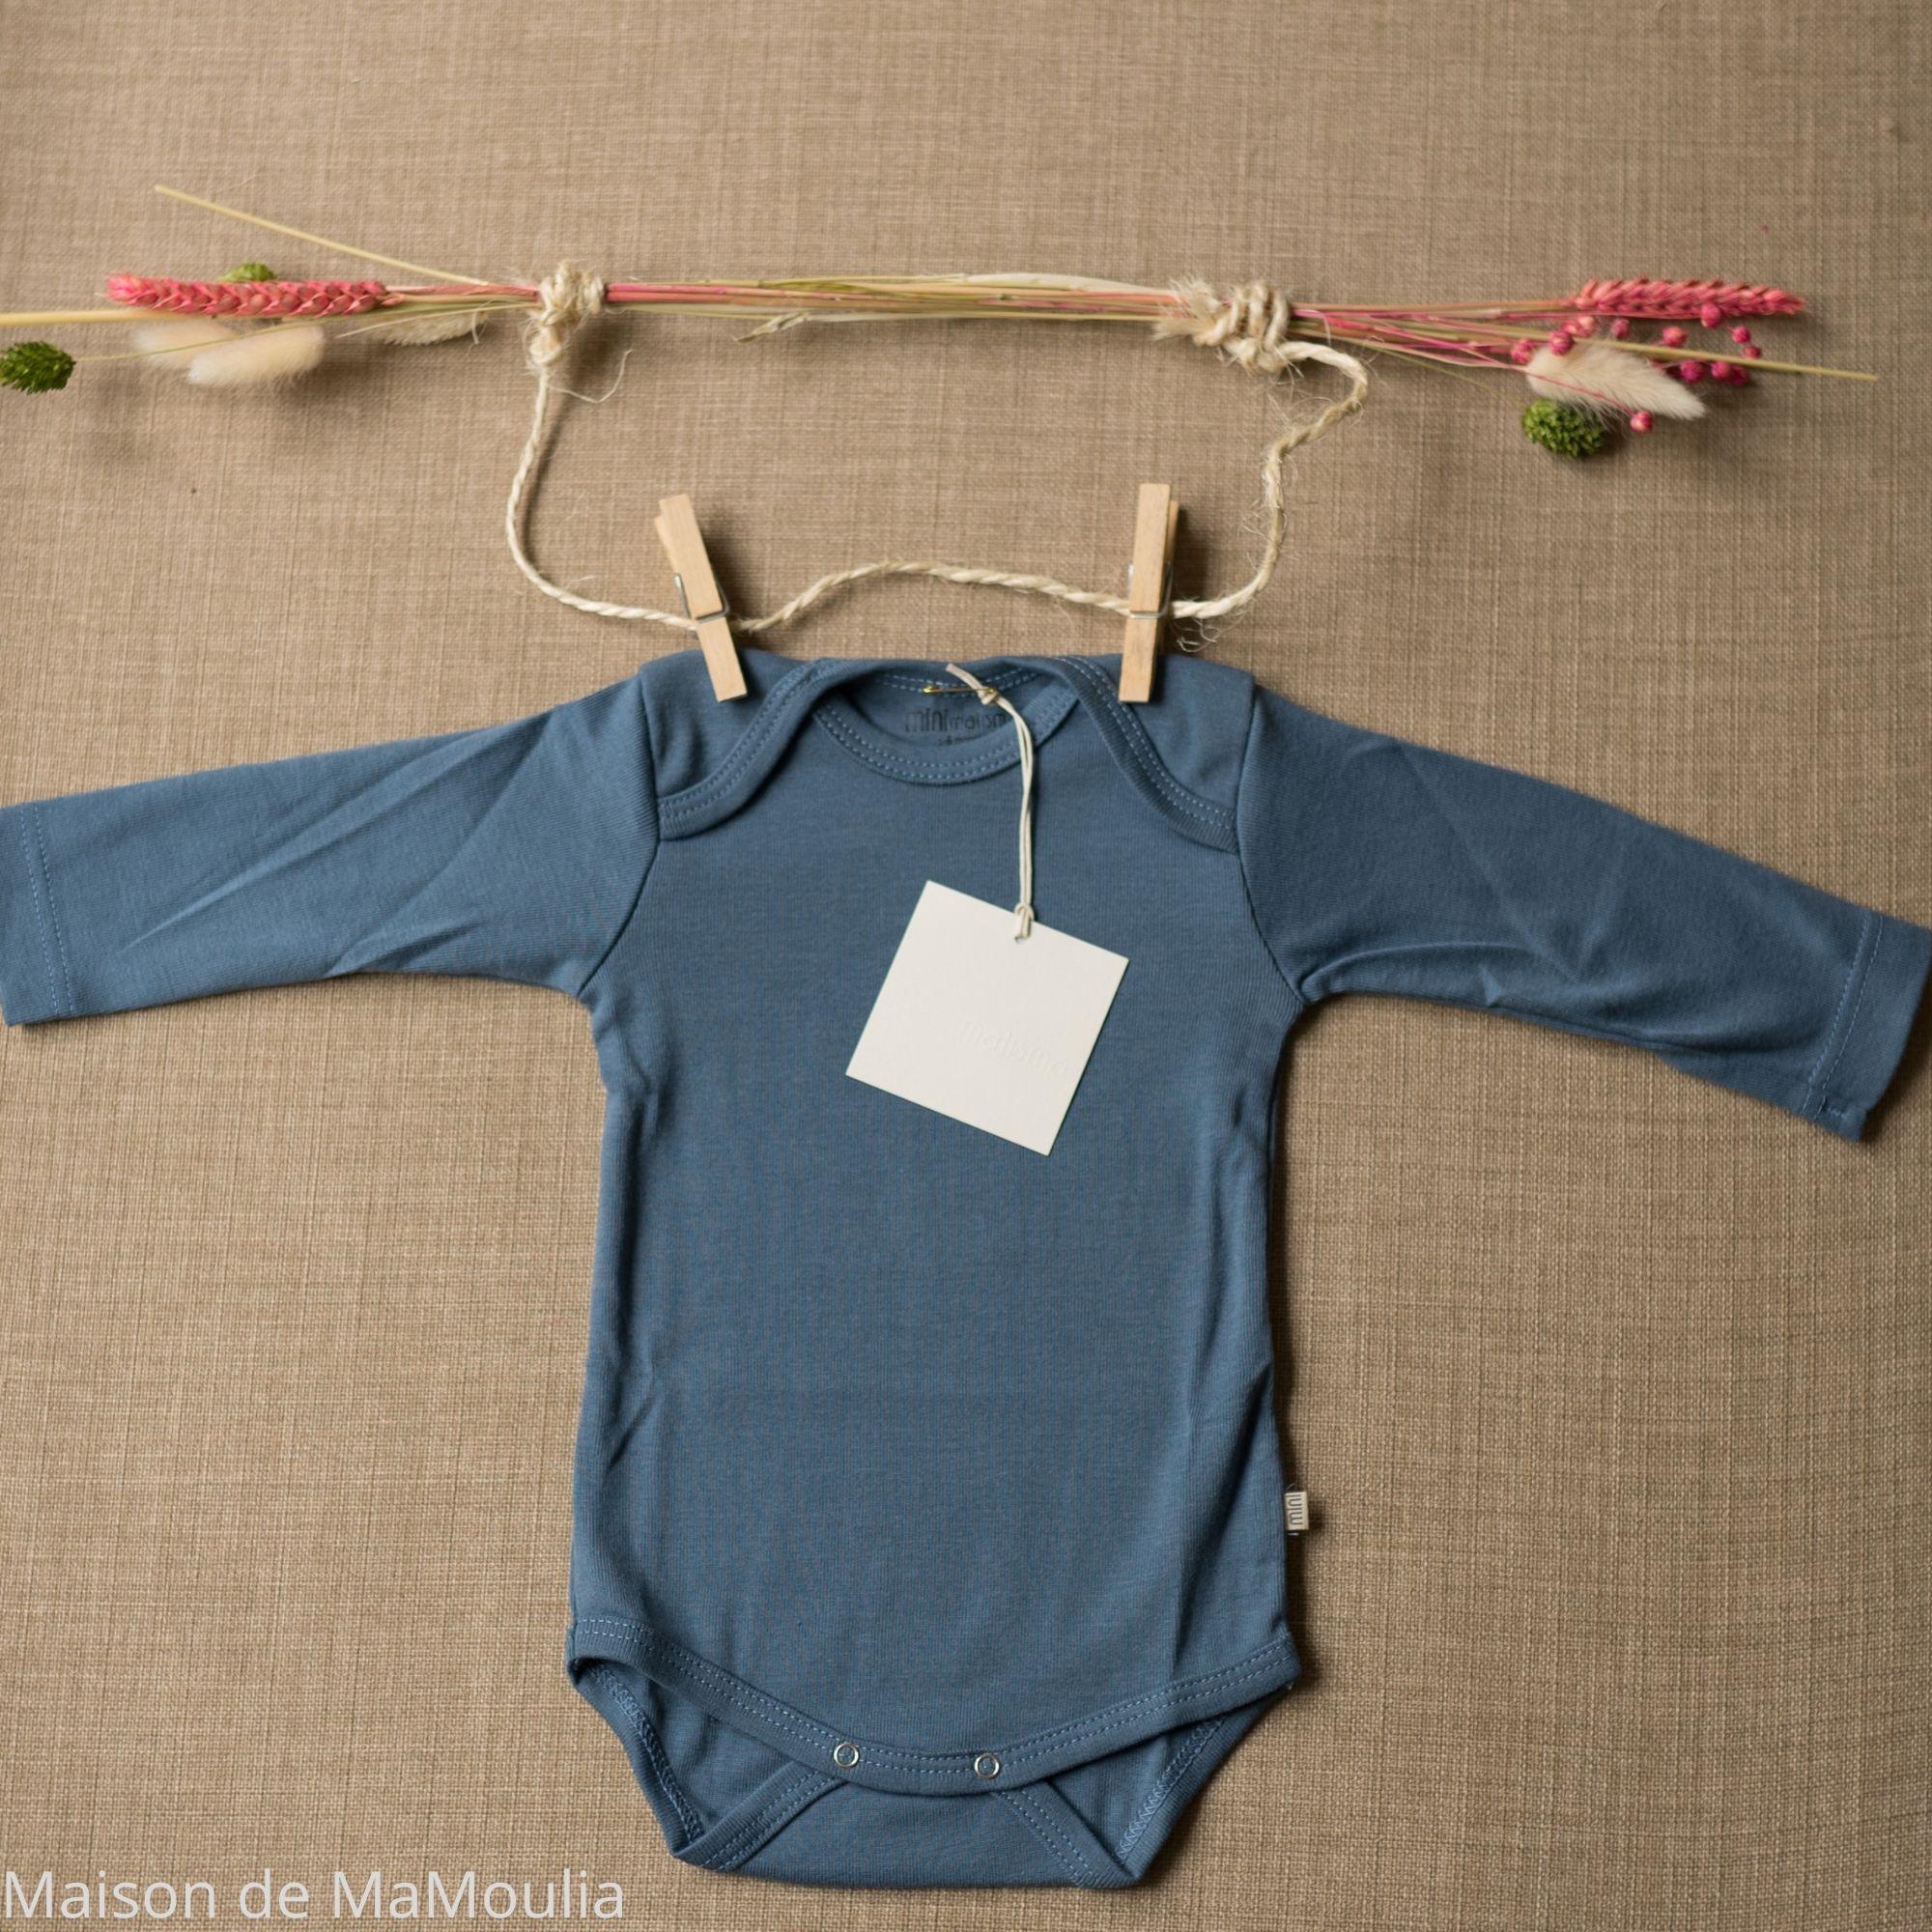 MINIMALISMA - Body bébé - 100 % coton bio - Nebel - Bleu